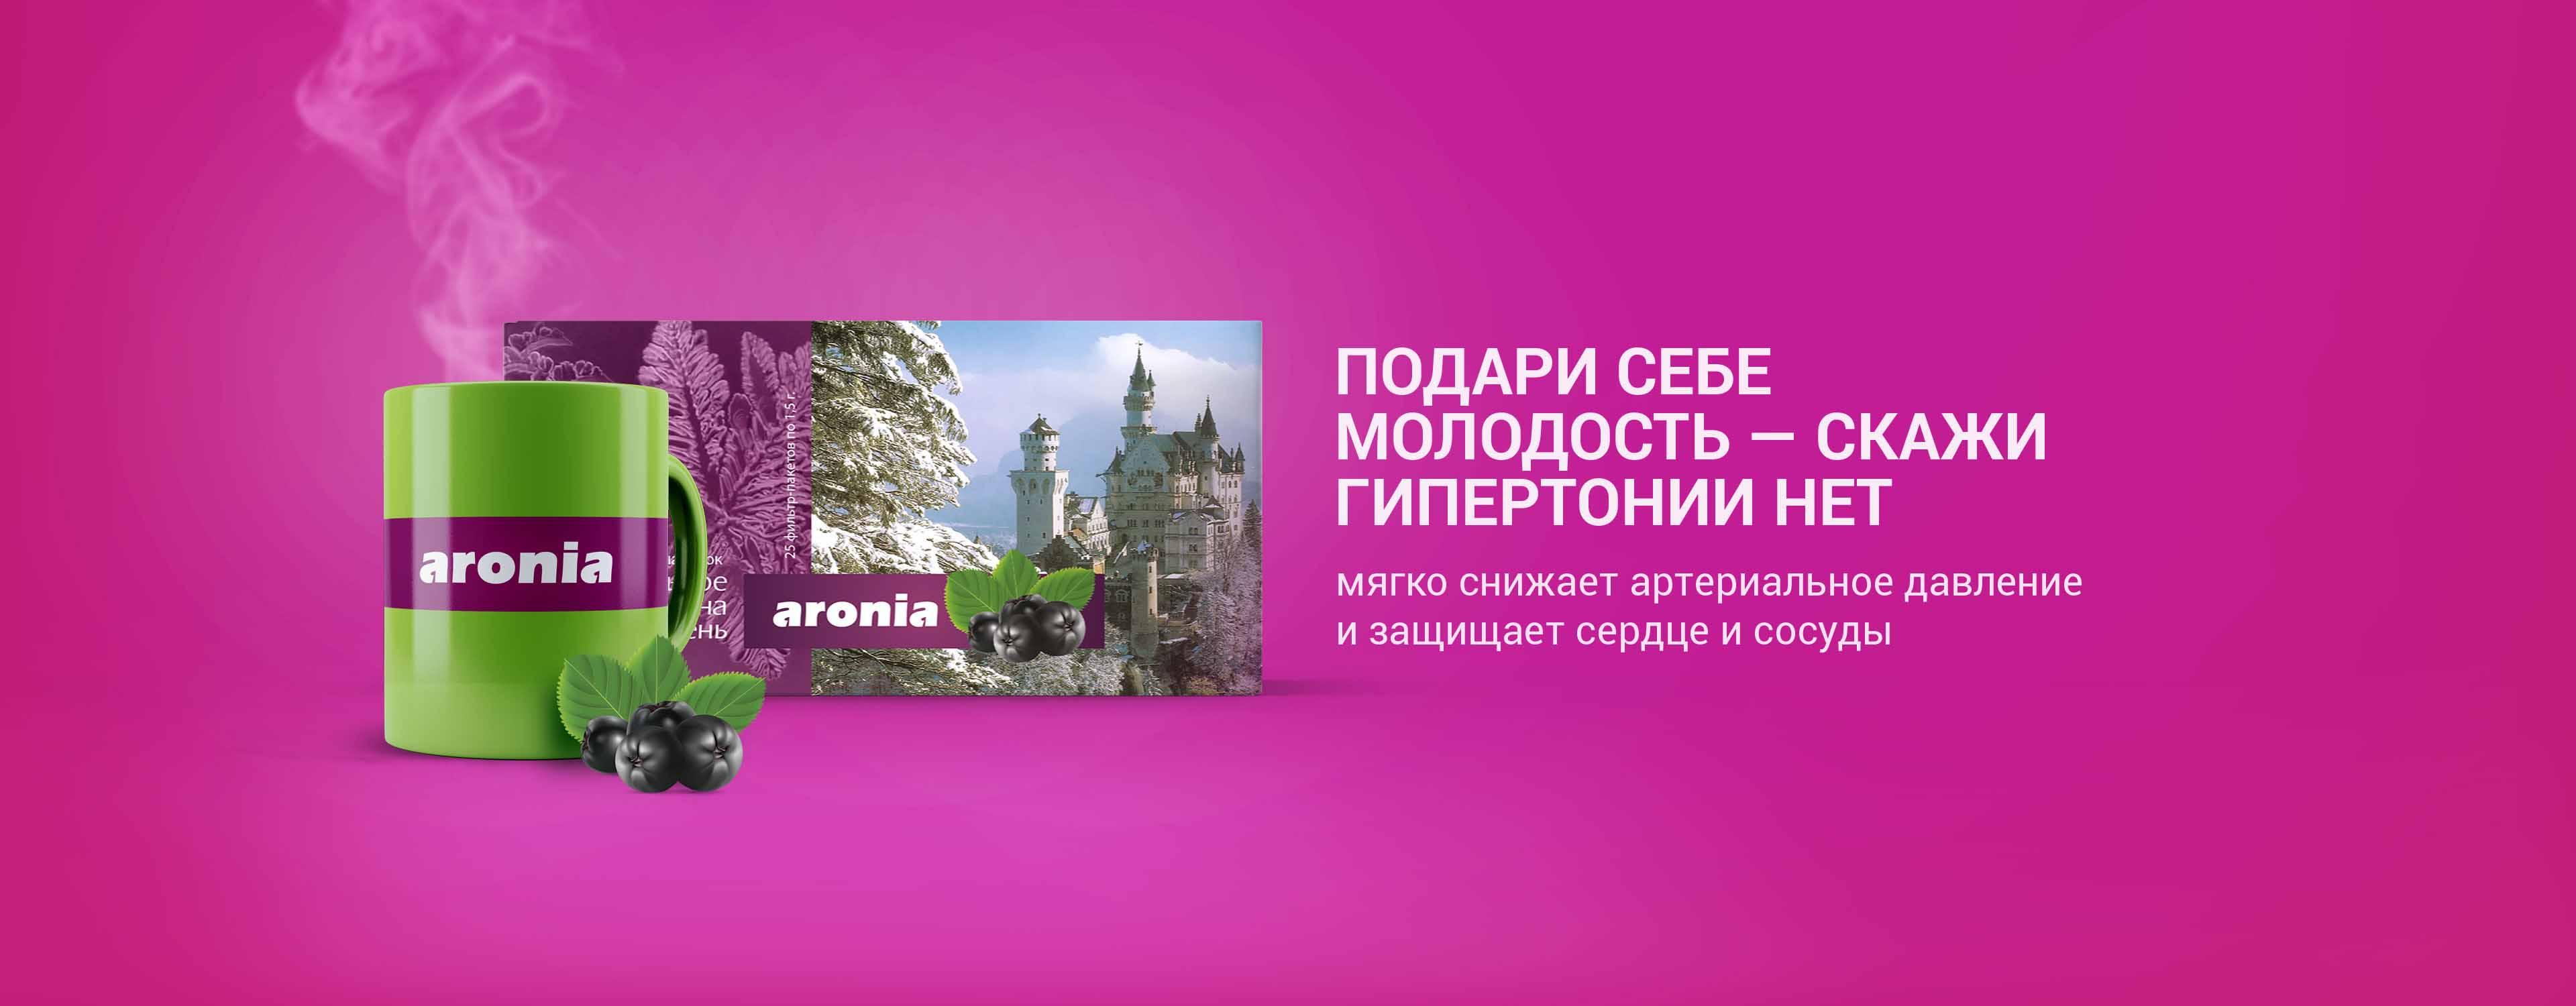 Aronia_3840x1500